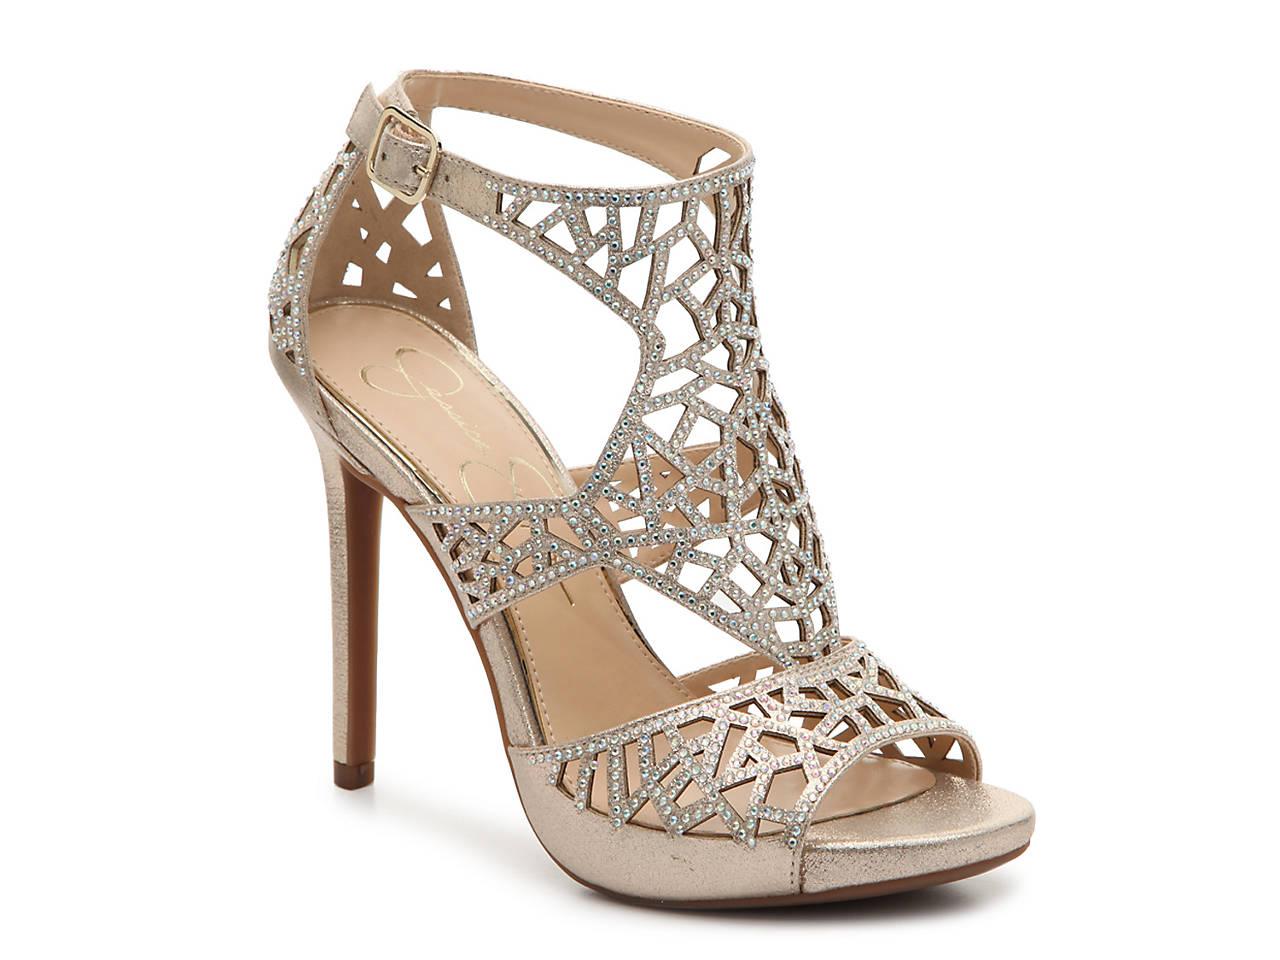 4f6cafbbf7c5 Jessica Simpson Romani Platform Sandal Women s Shoes